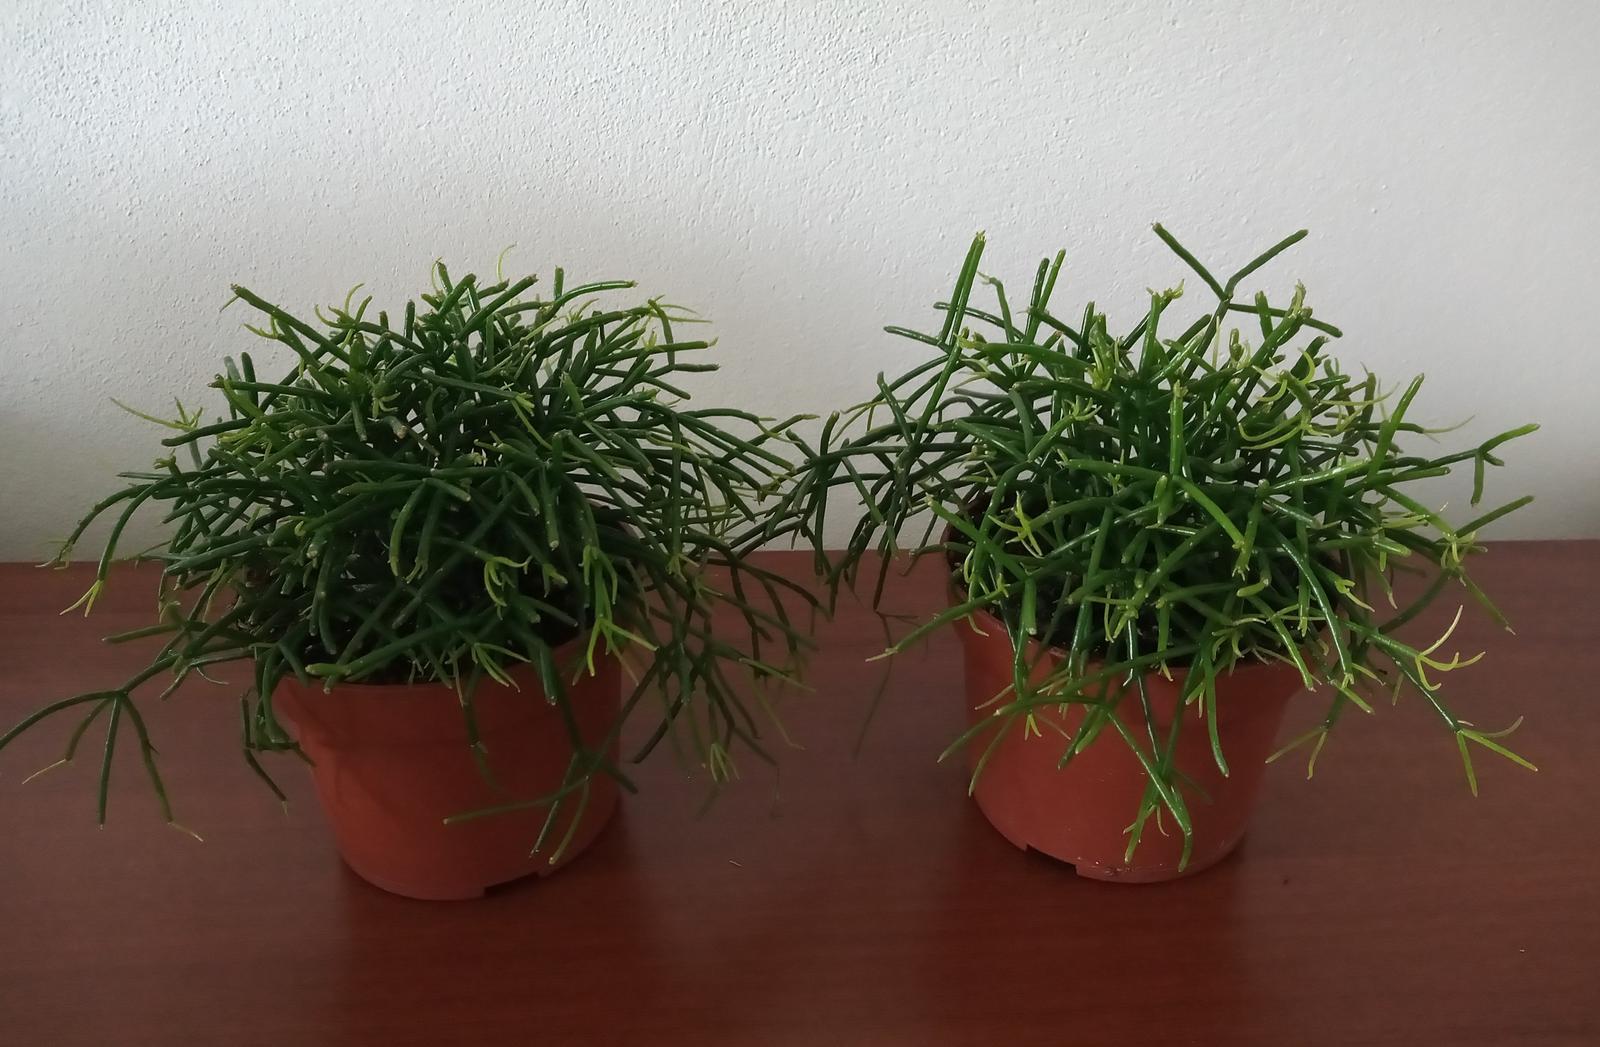 Rhipsalis cassutha - Obrázok č. 1